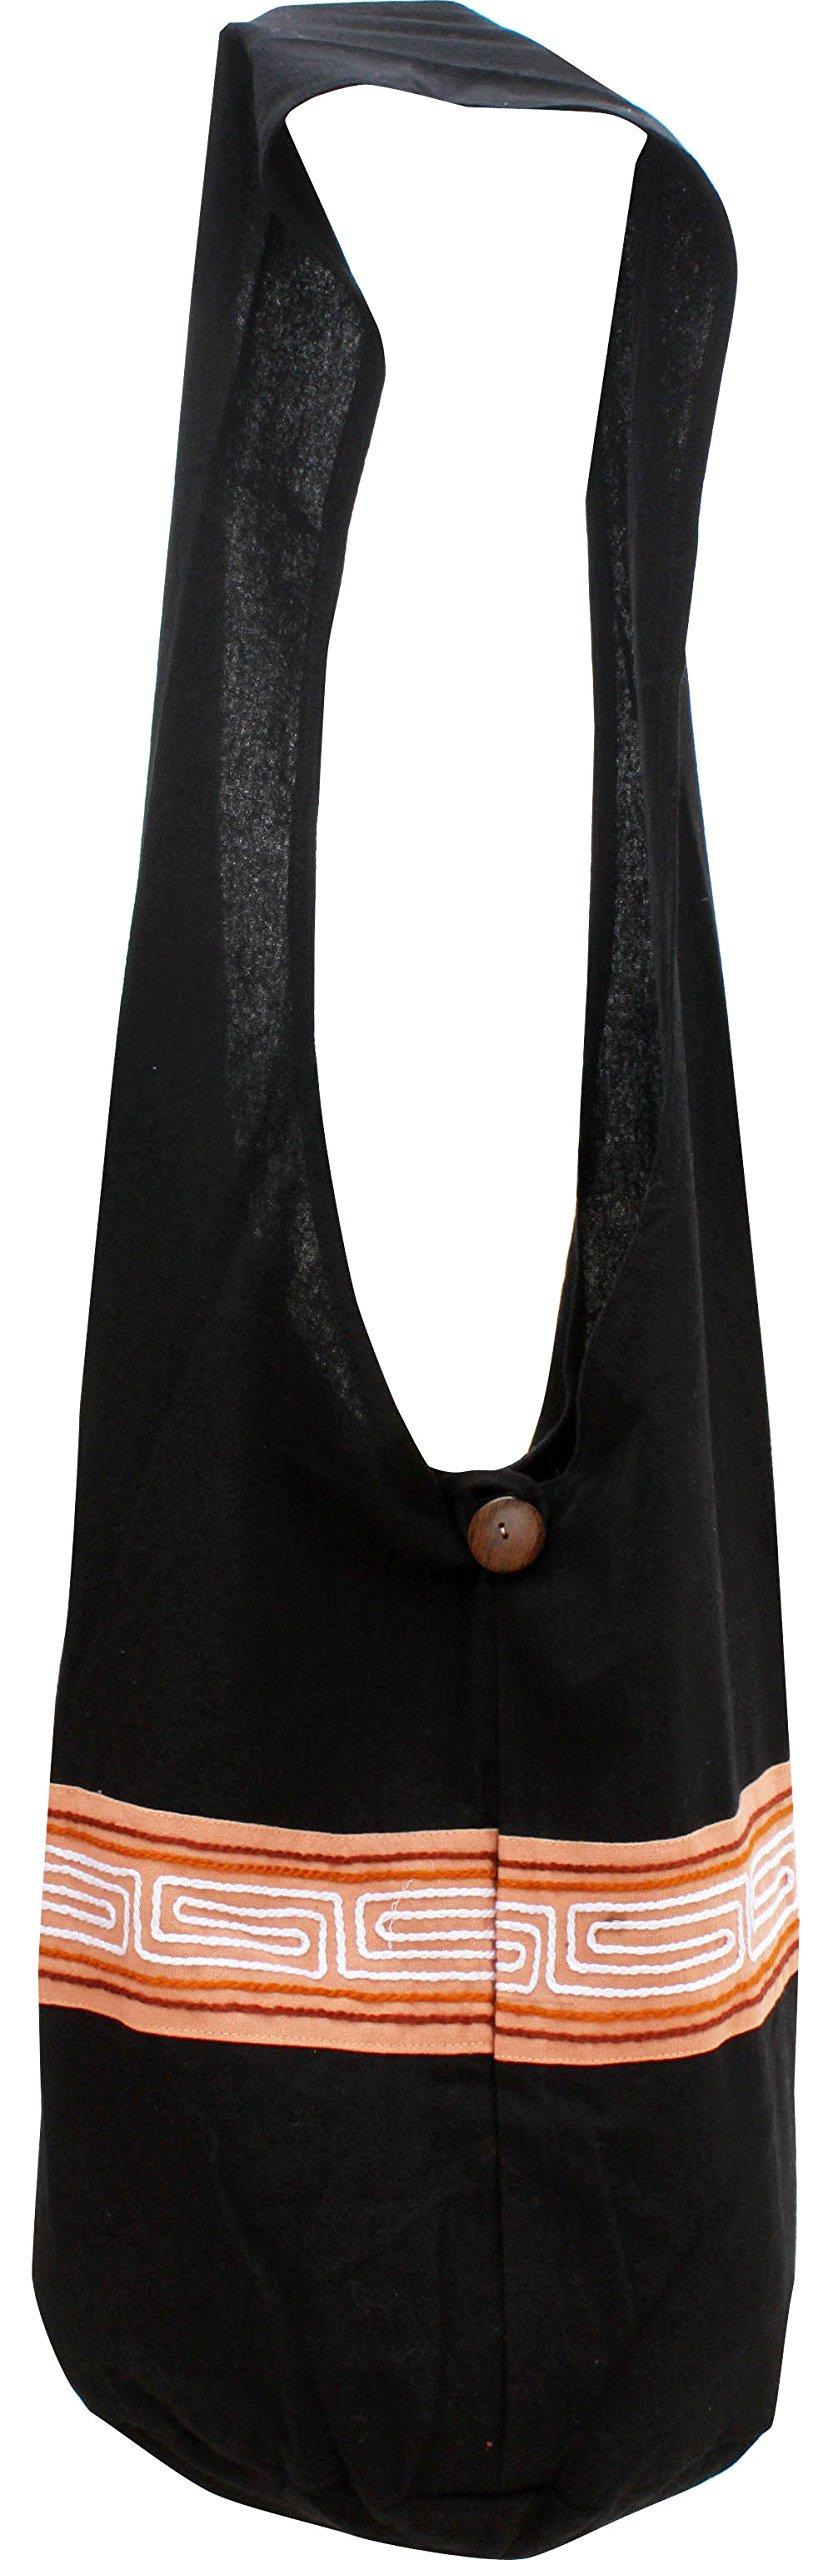 RaanPahMuang Brand Yaam Monks Cotton Shoulder Bag with Chinese Grain Line Motif, X-Large, Black tab Baby Pink